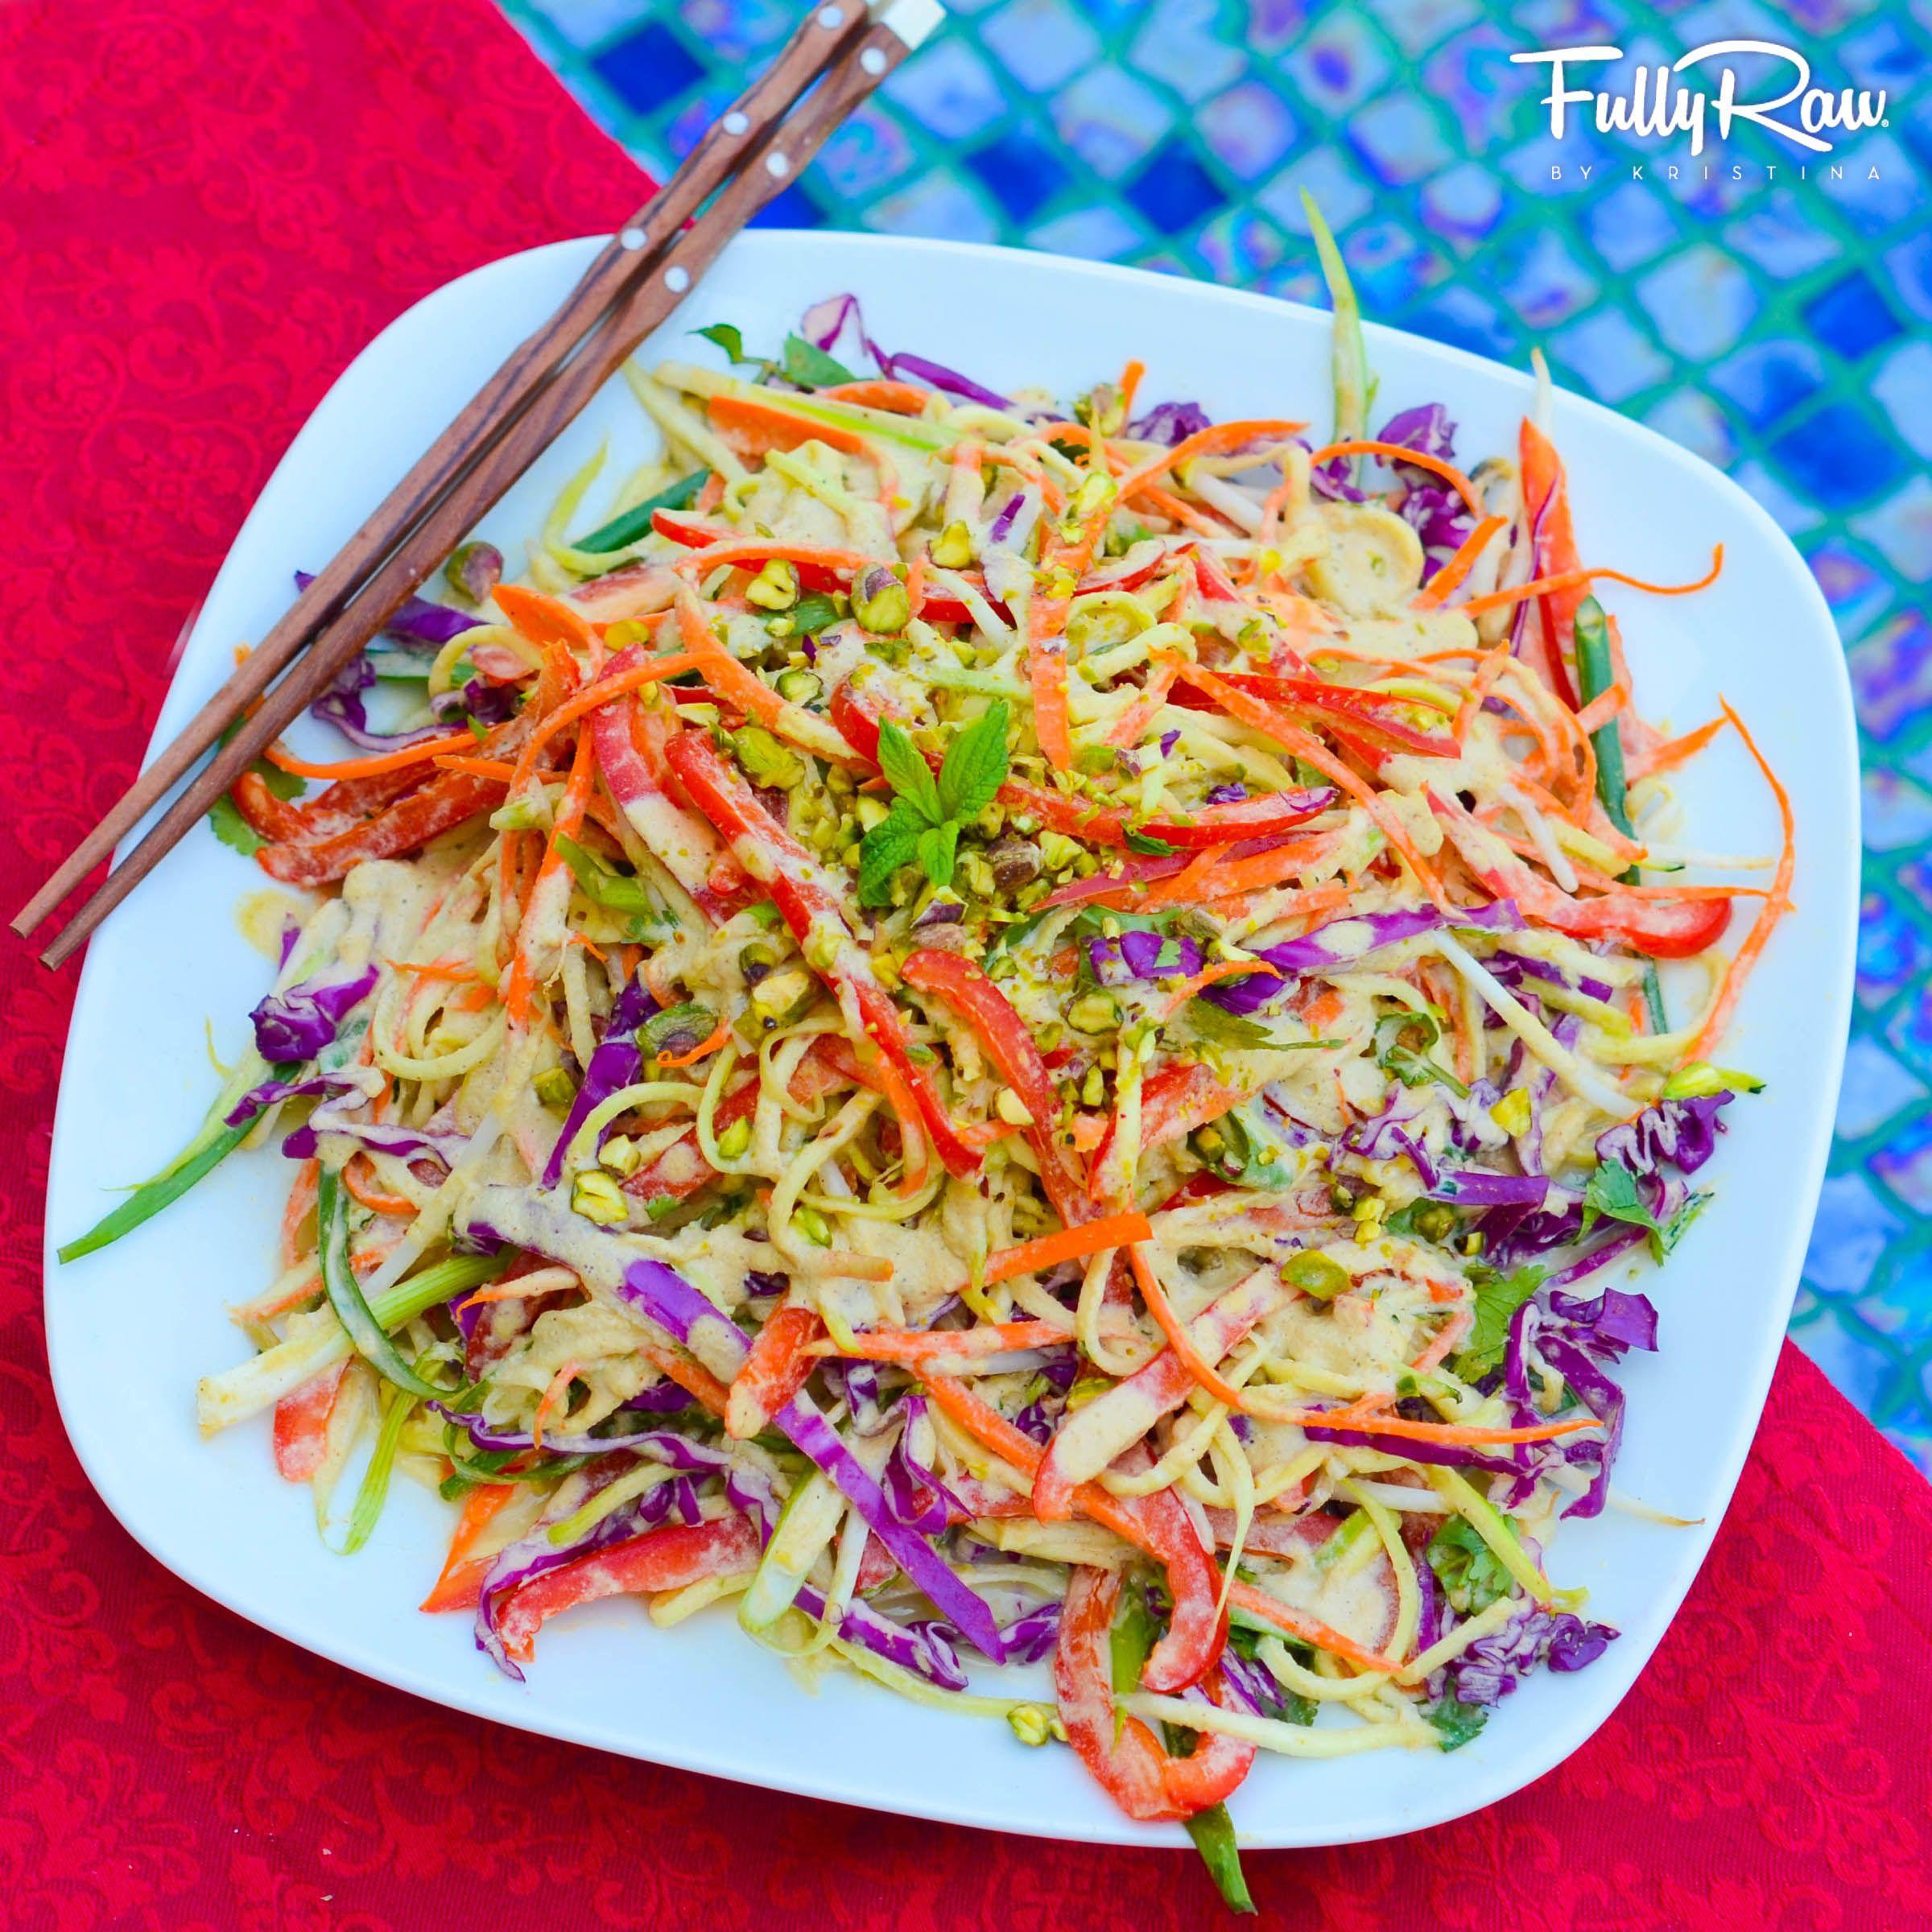 Raw vegan pad thai recipe here httpyoutubewatchv raw vegan pad thai recipe here httpyoutube forumfinder Image collections